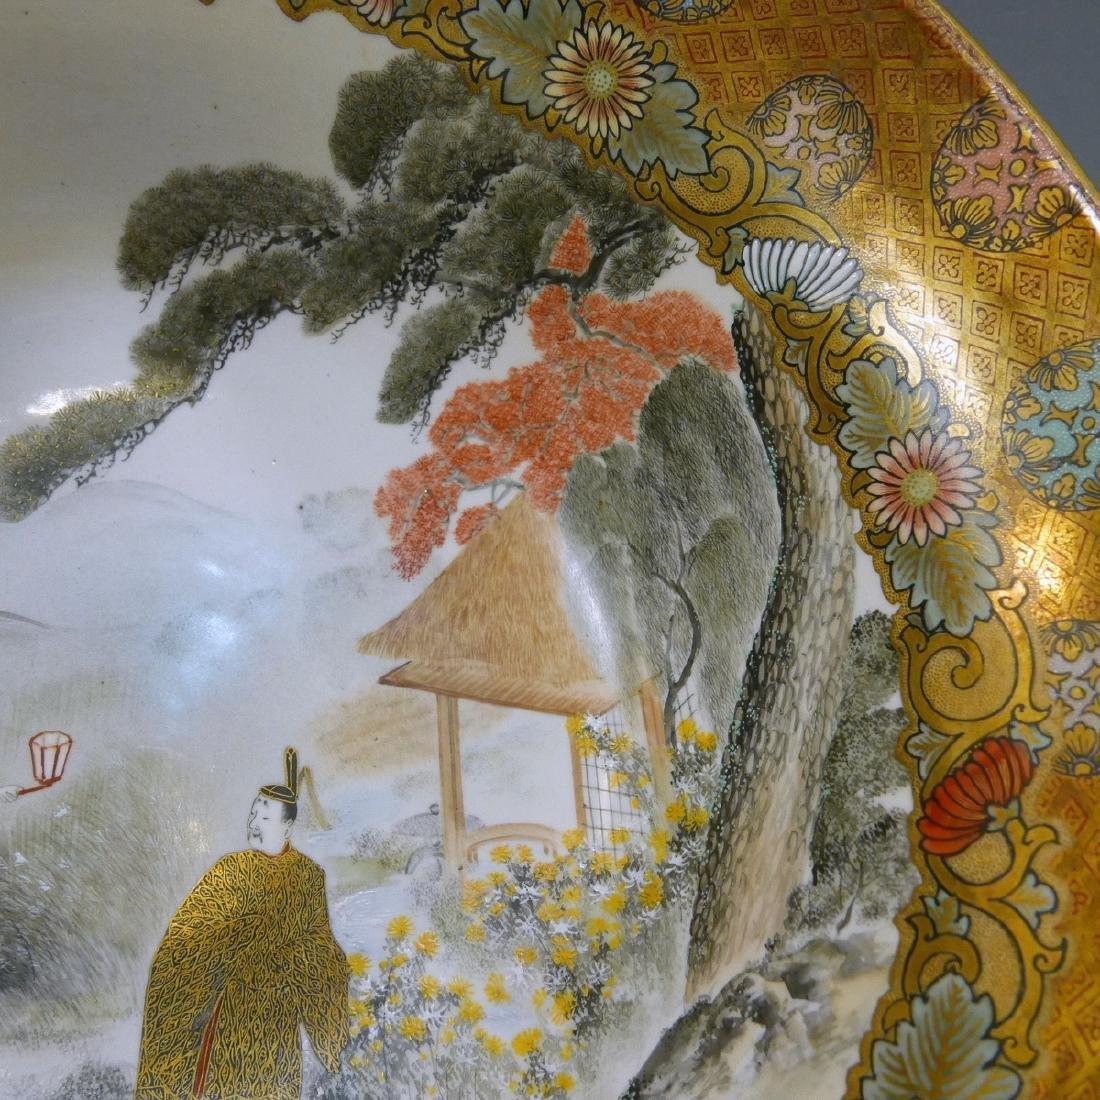 FINEST JAPANESE ANTIQUE KUTANI BOWL - MEIJI PERIOD - 3